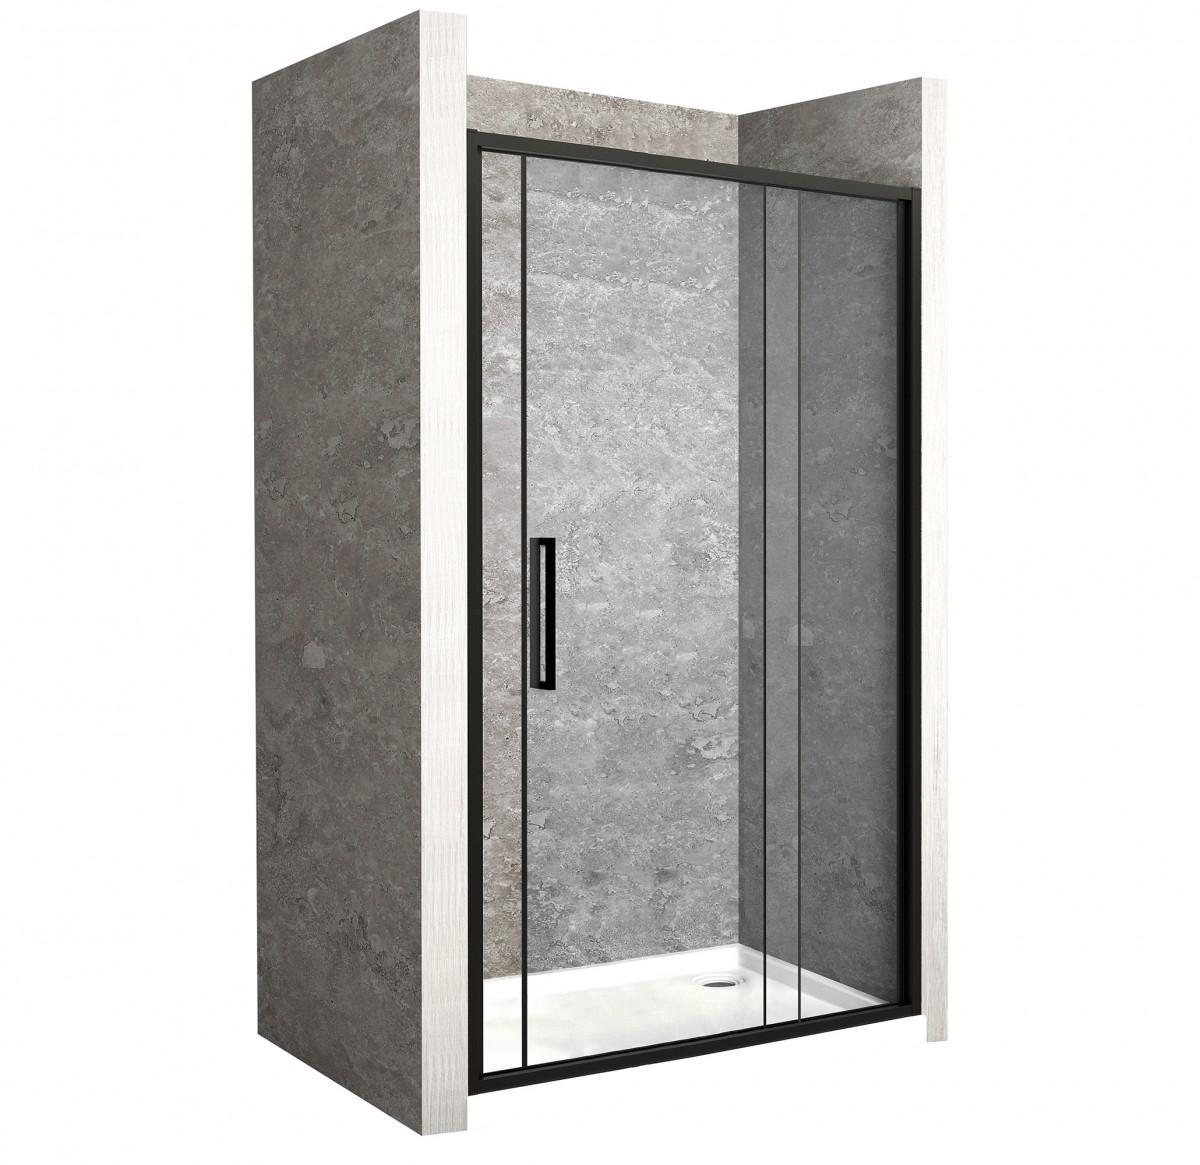 Sprchové dveře Rapid Slide 160 cm